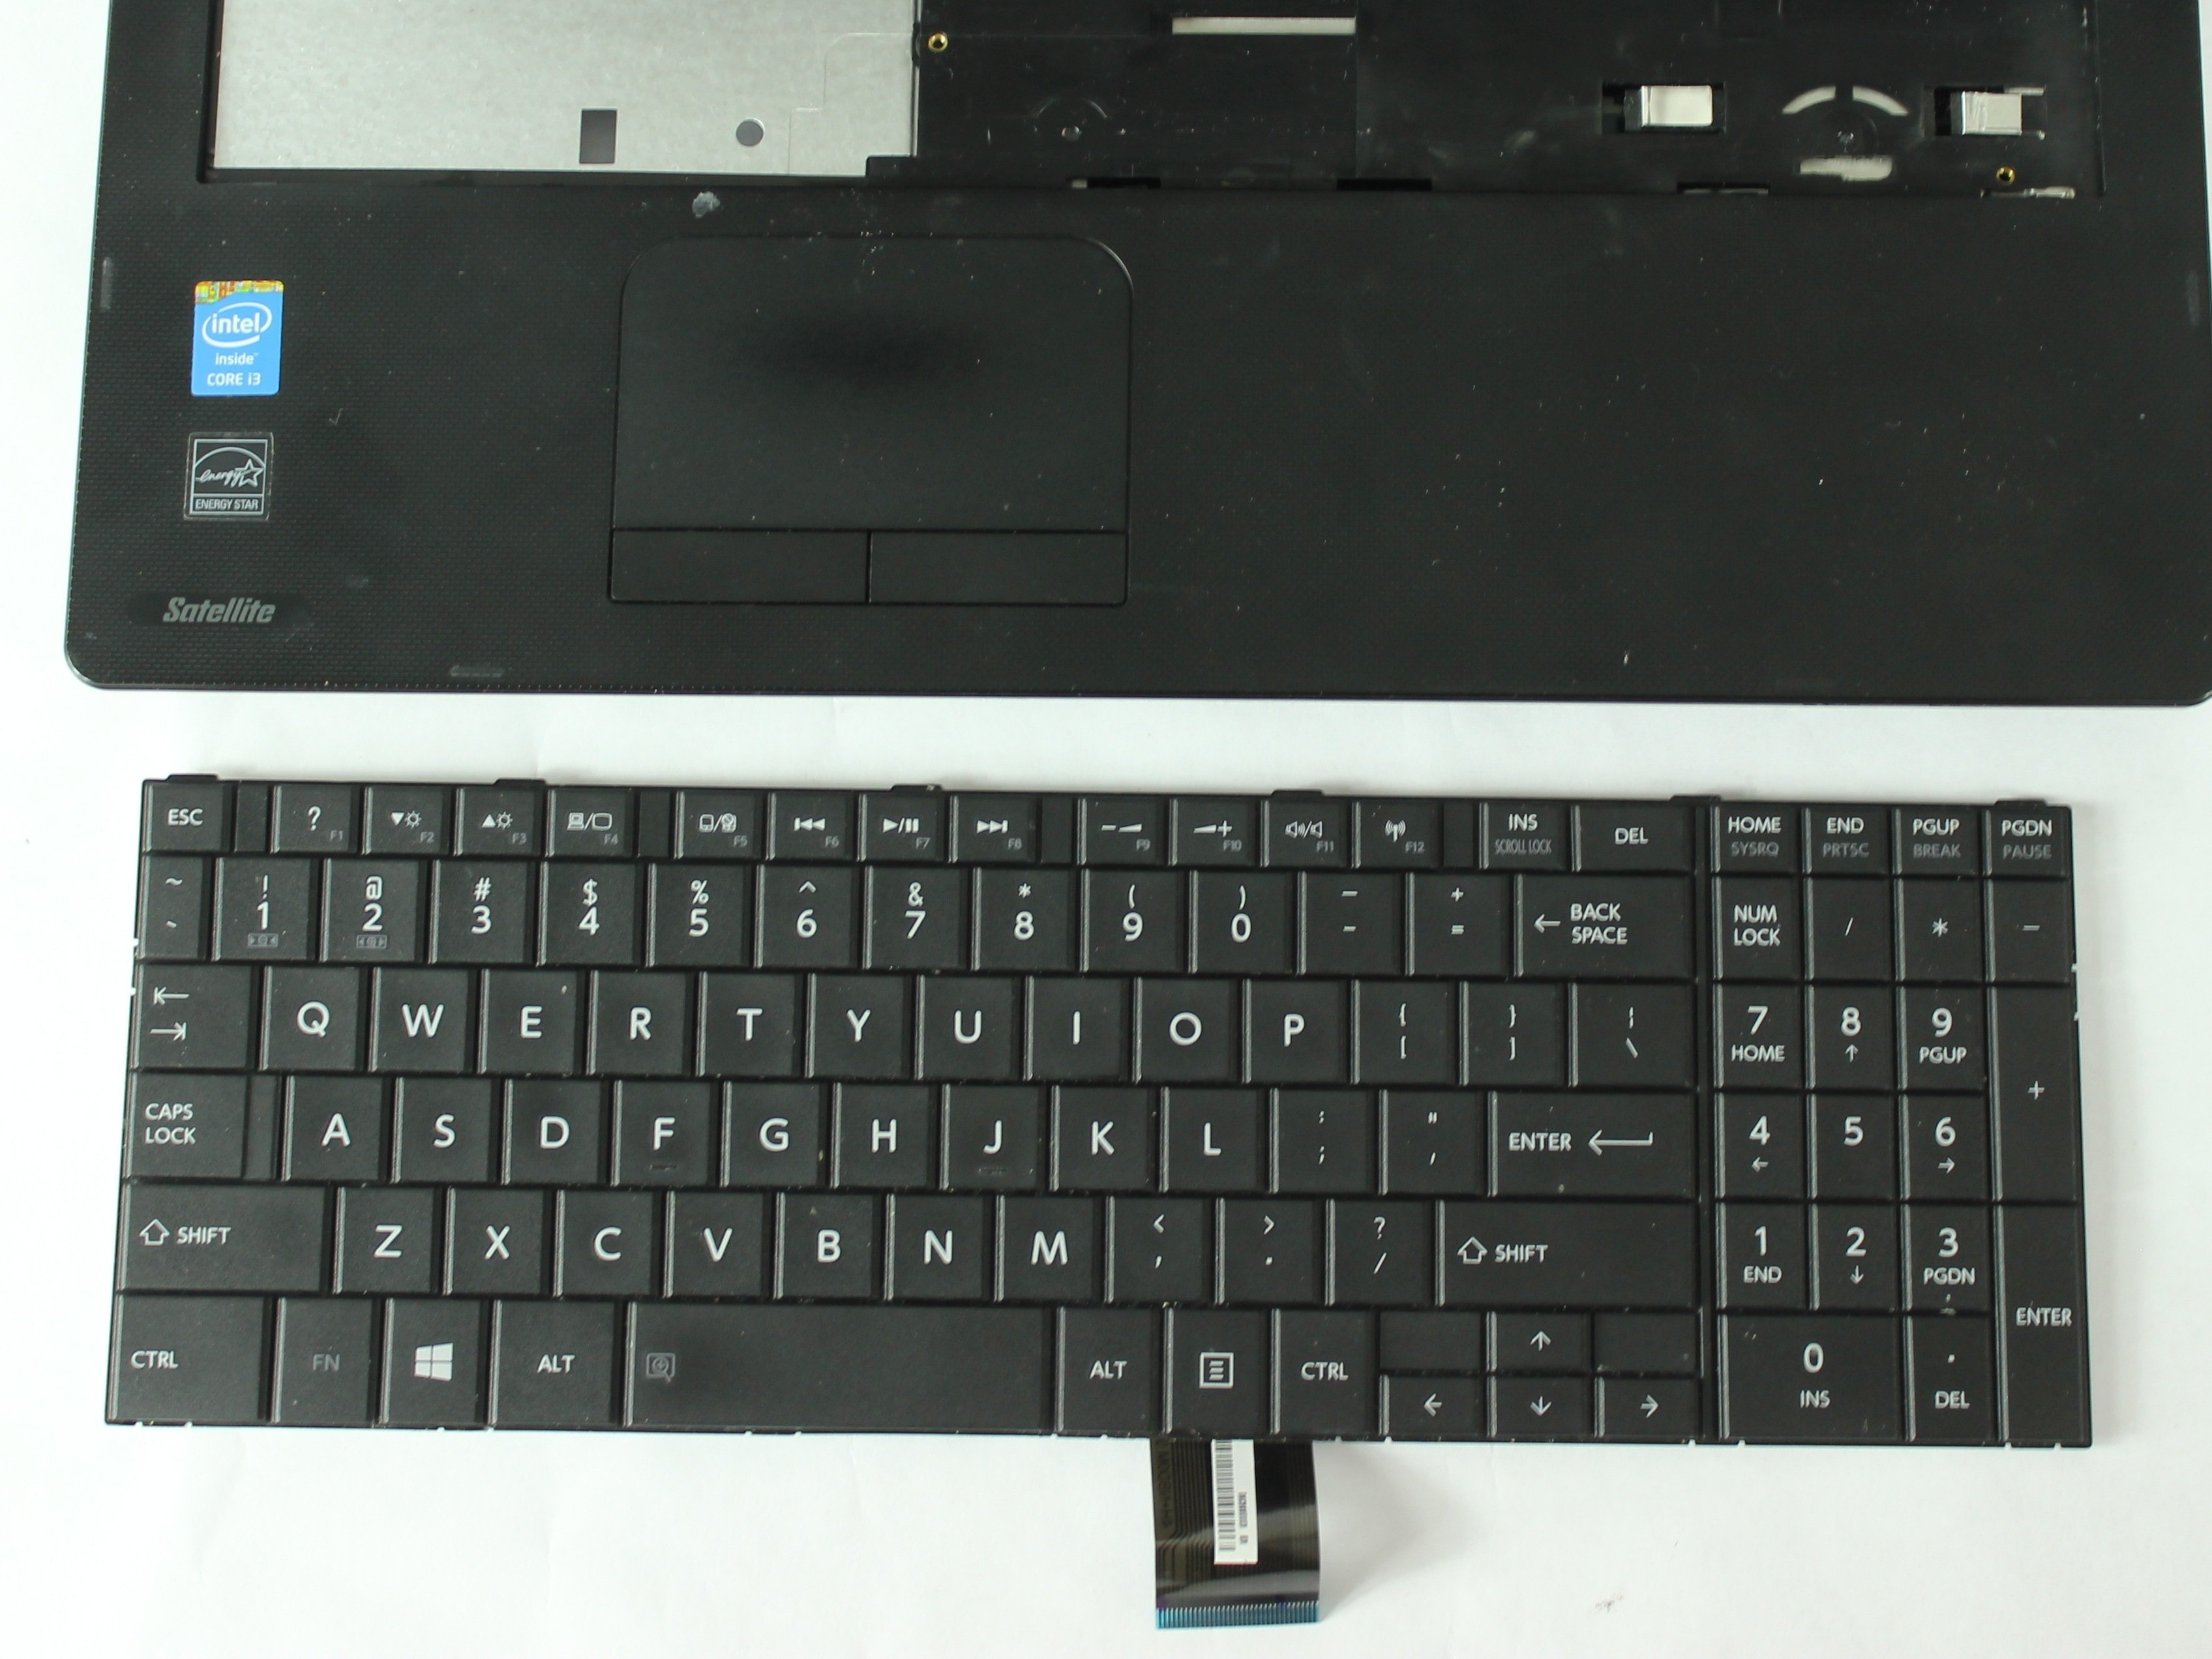 Toshiba Satellite C55 B5200 Keyboard Replacement Ifixit Repair Guide